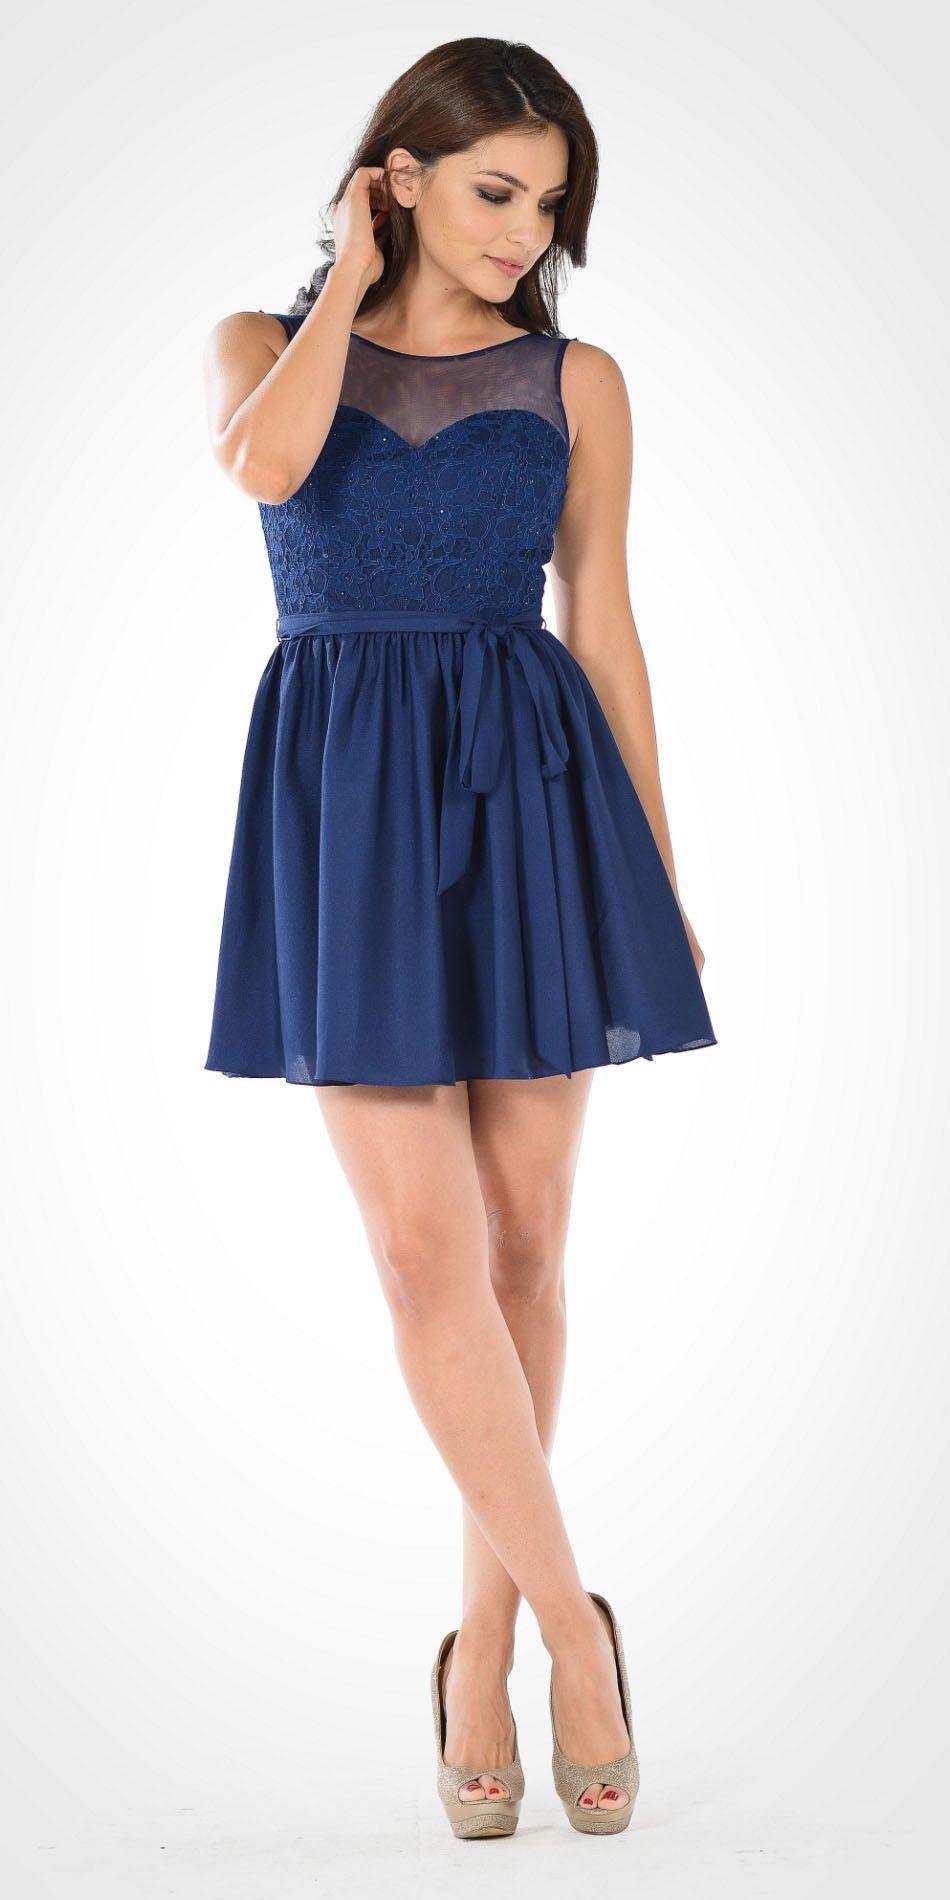 Illusion Lace Bodice Sleeveless Homecoming Short Dress Off White